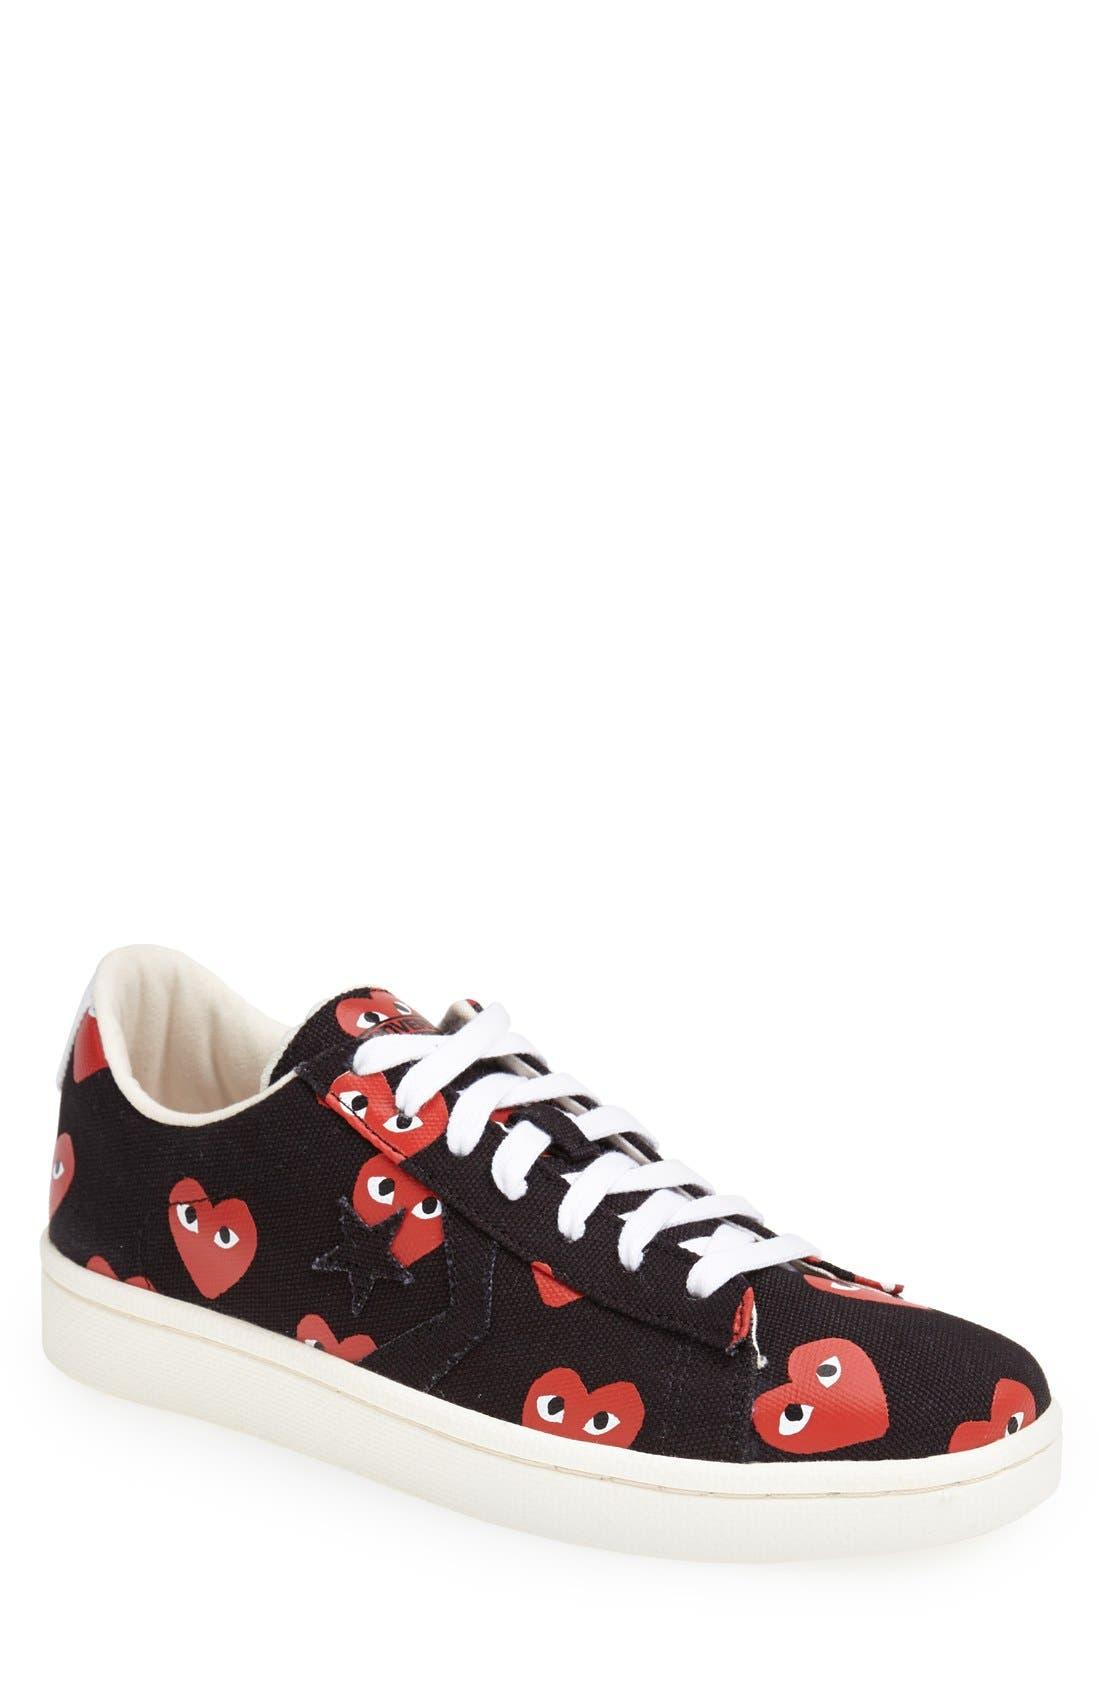 Main Image - Comme des Garçons PLAY x Converse Chuck Taylor® Low Top Sneaker (Men)